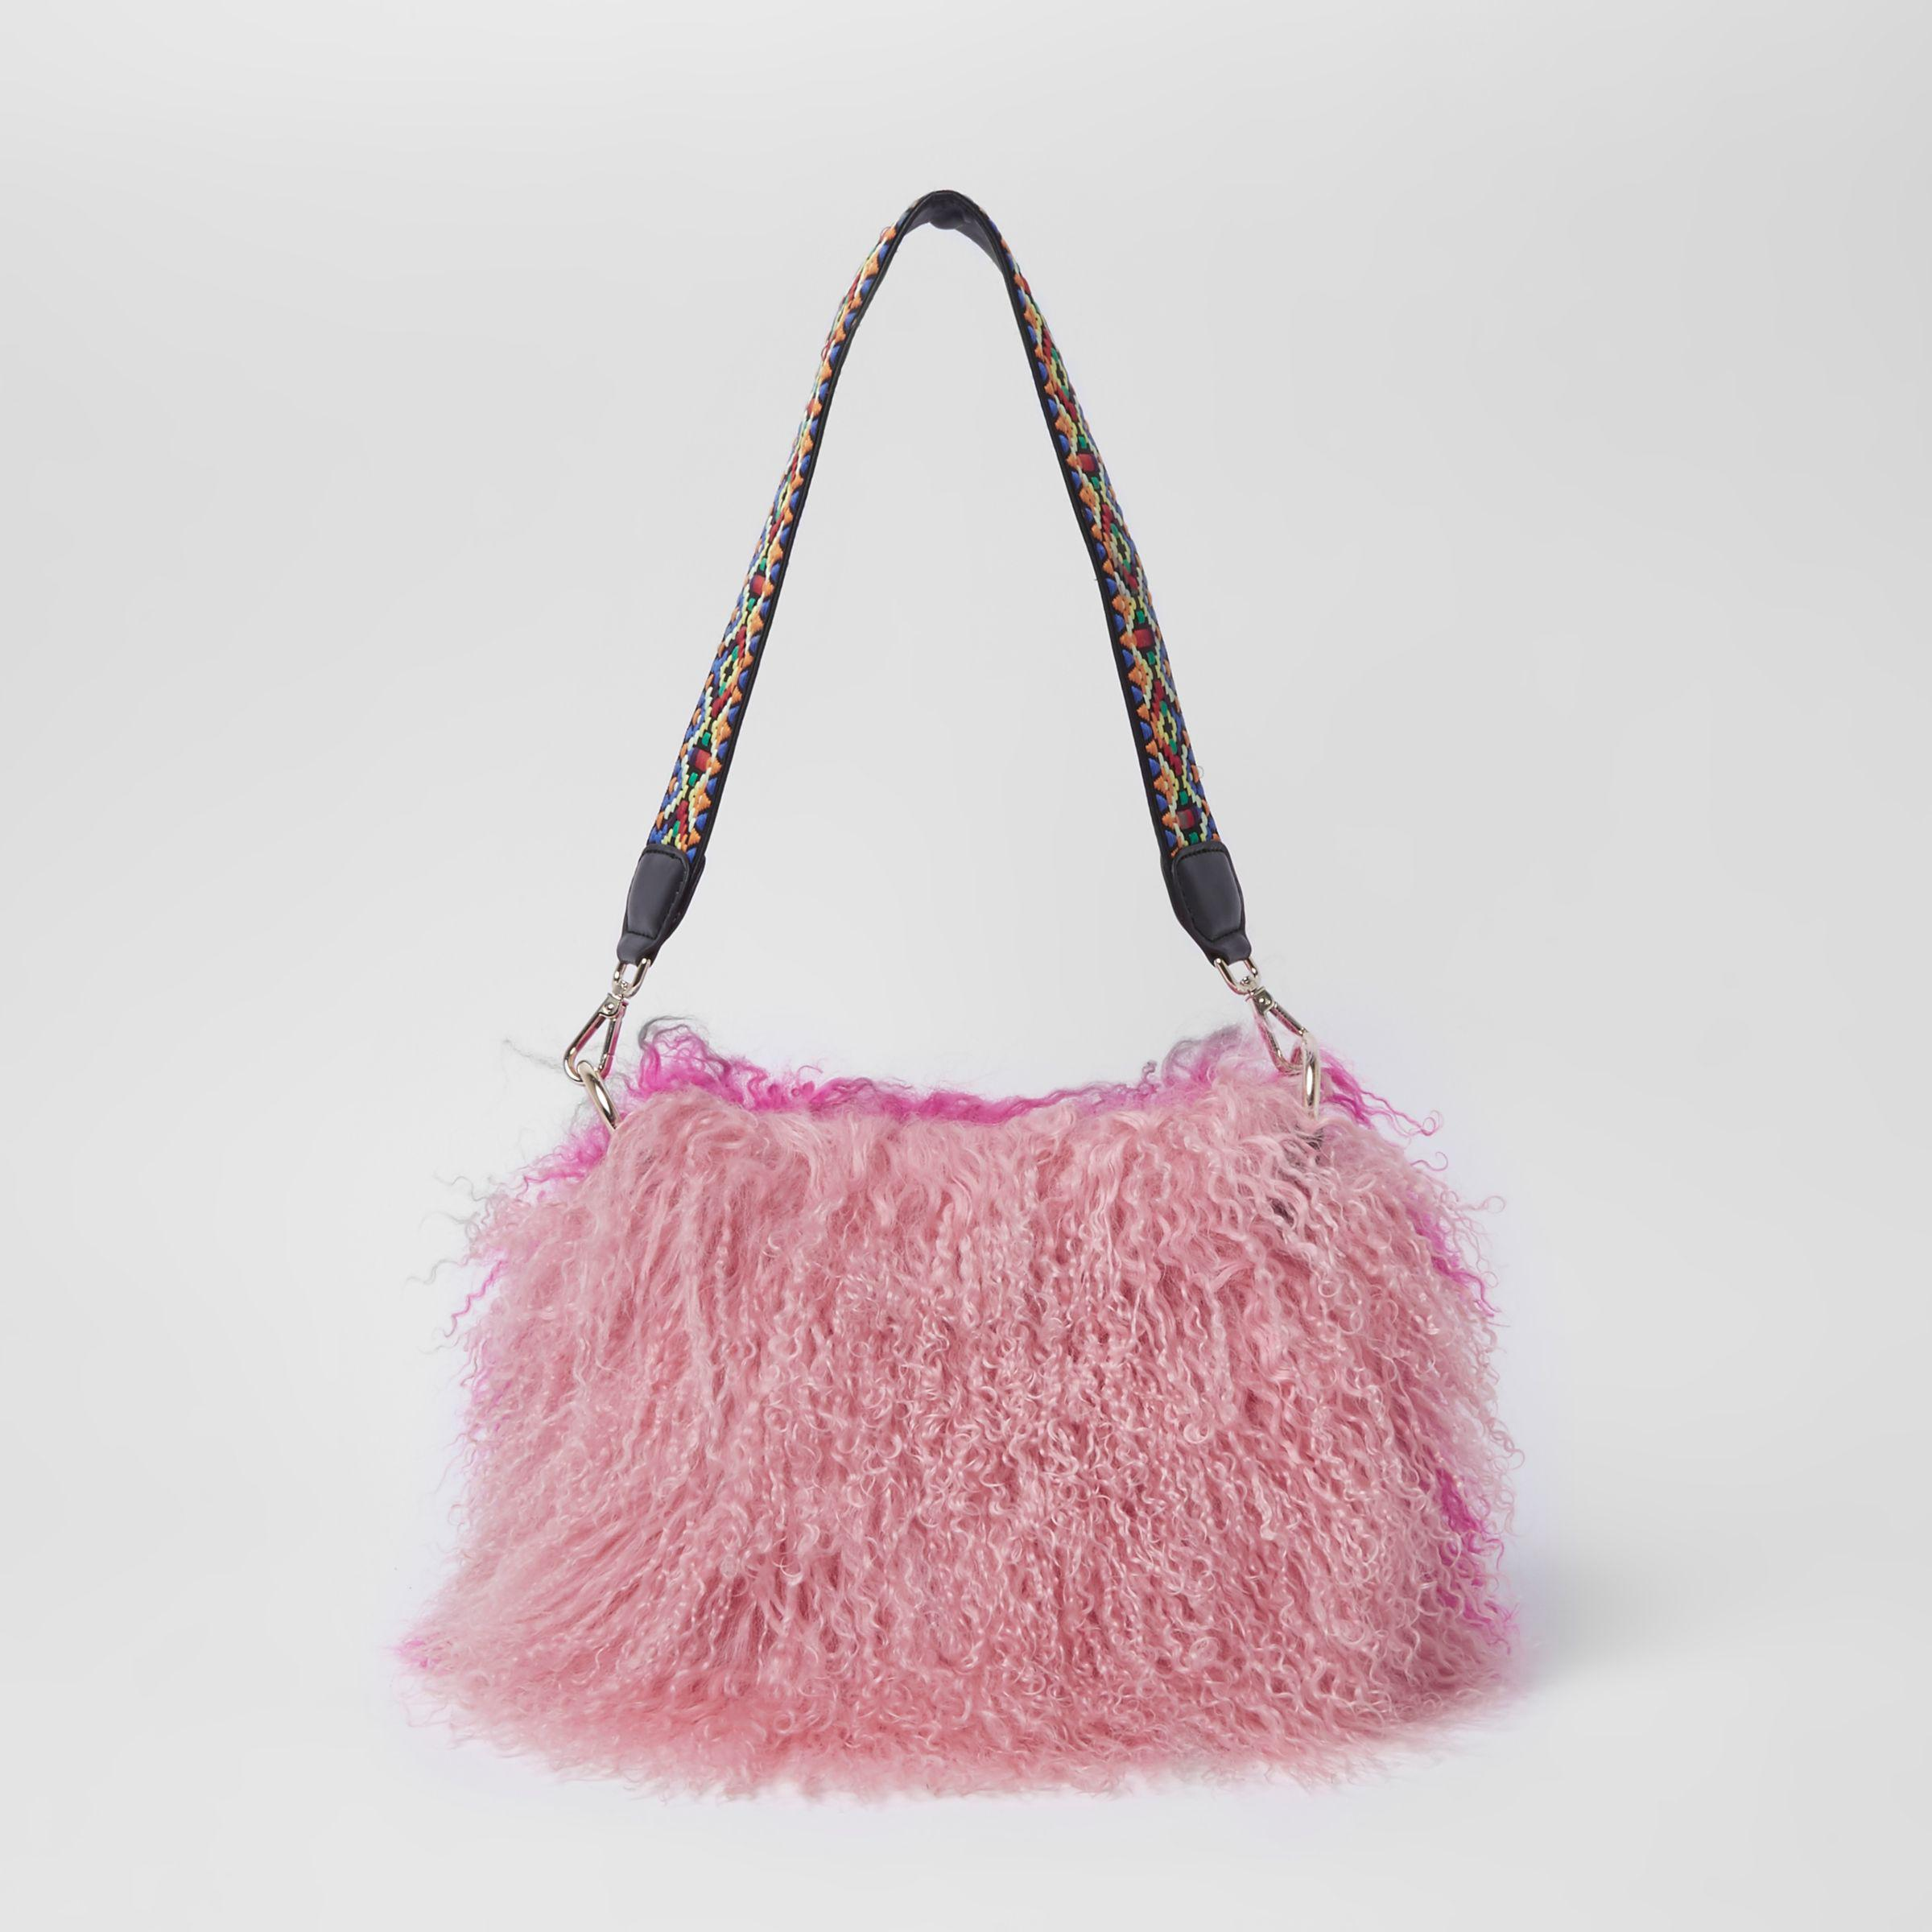 4c86b04c8f73 River Island Pink Mongolian Cross Body Bag in Pink - Lyst